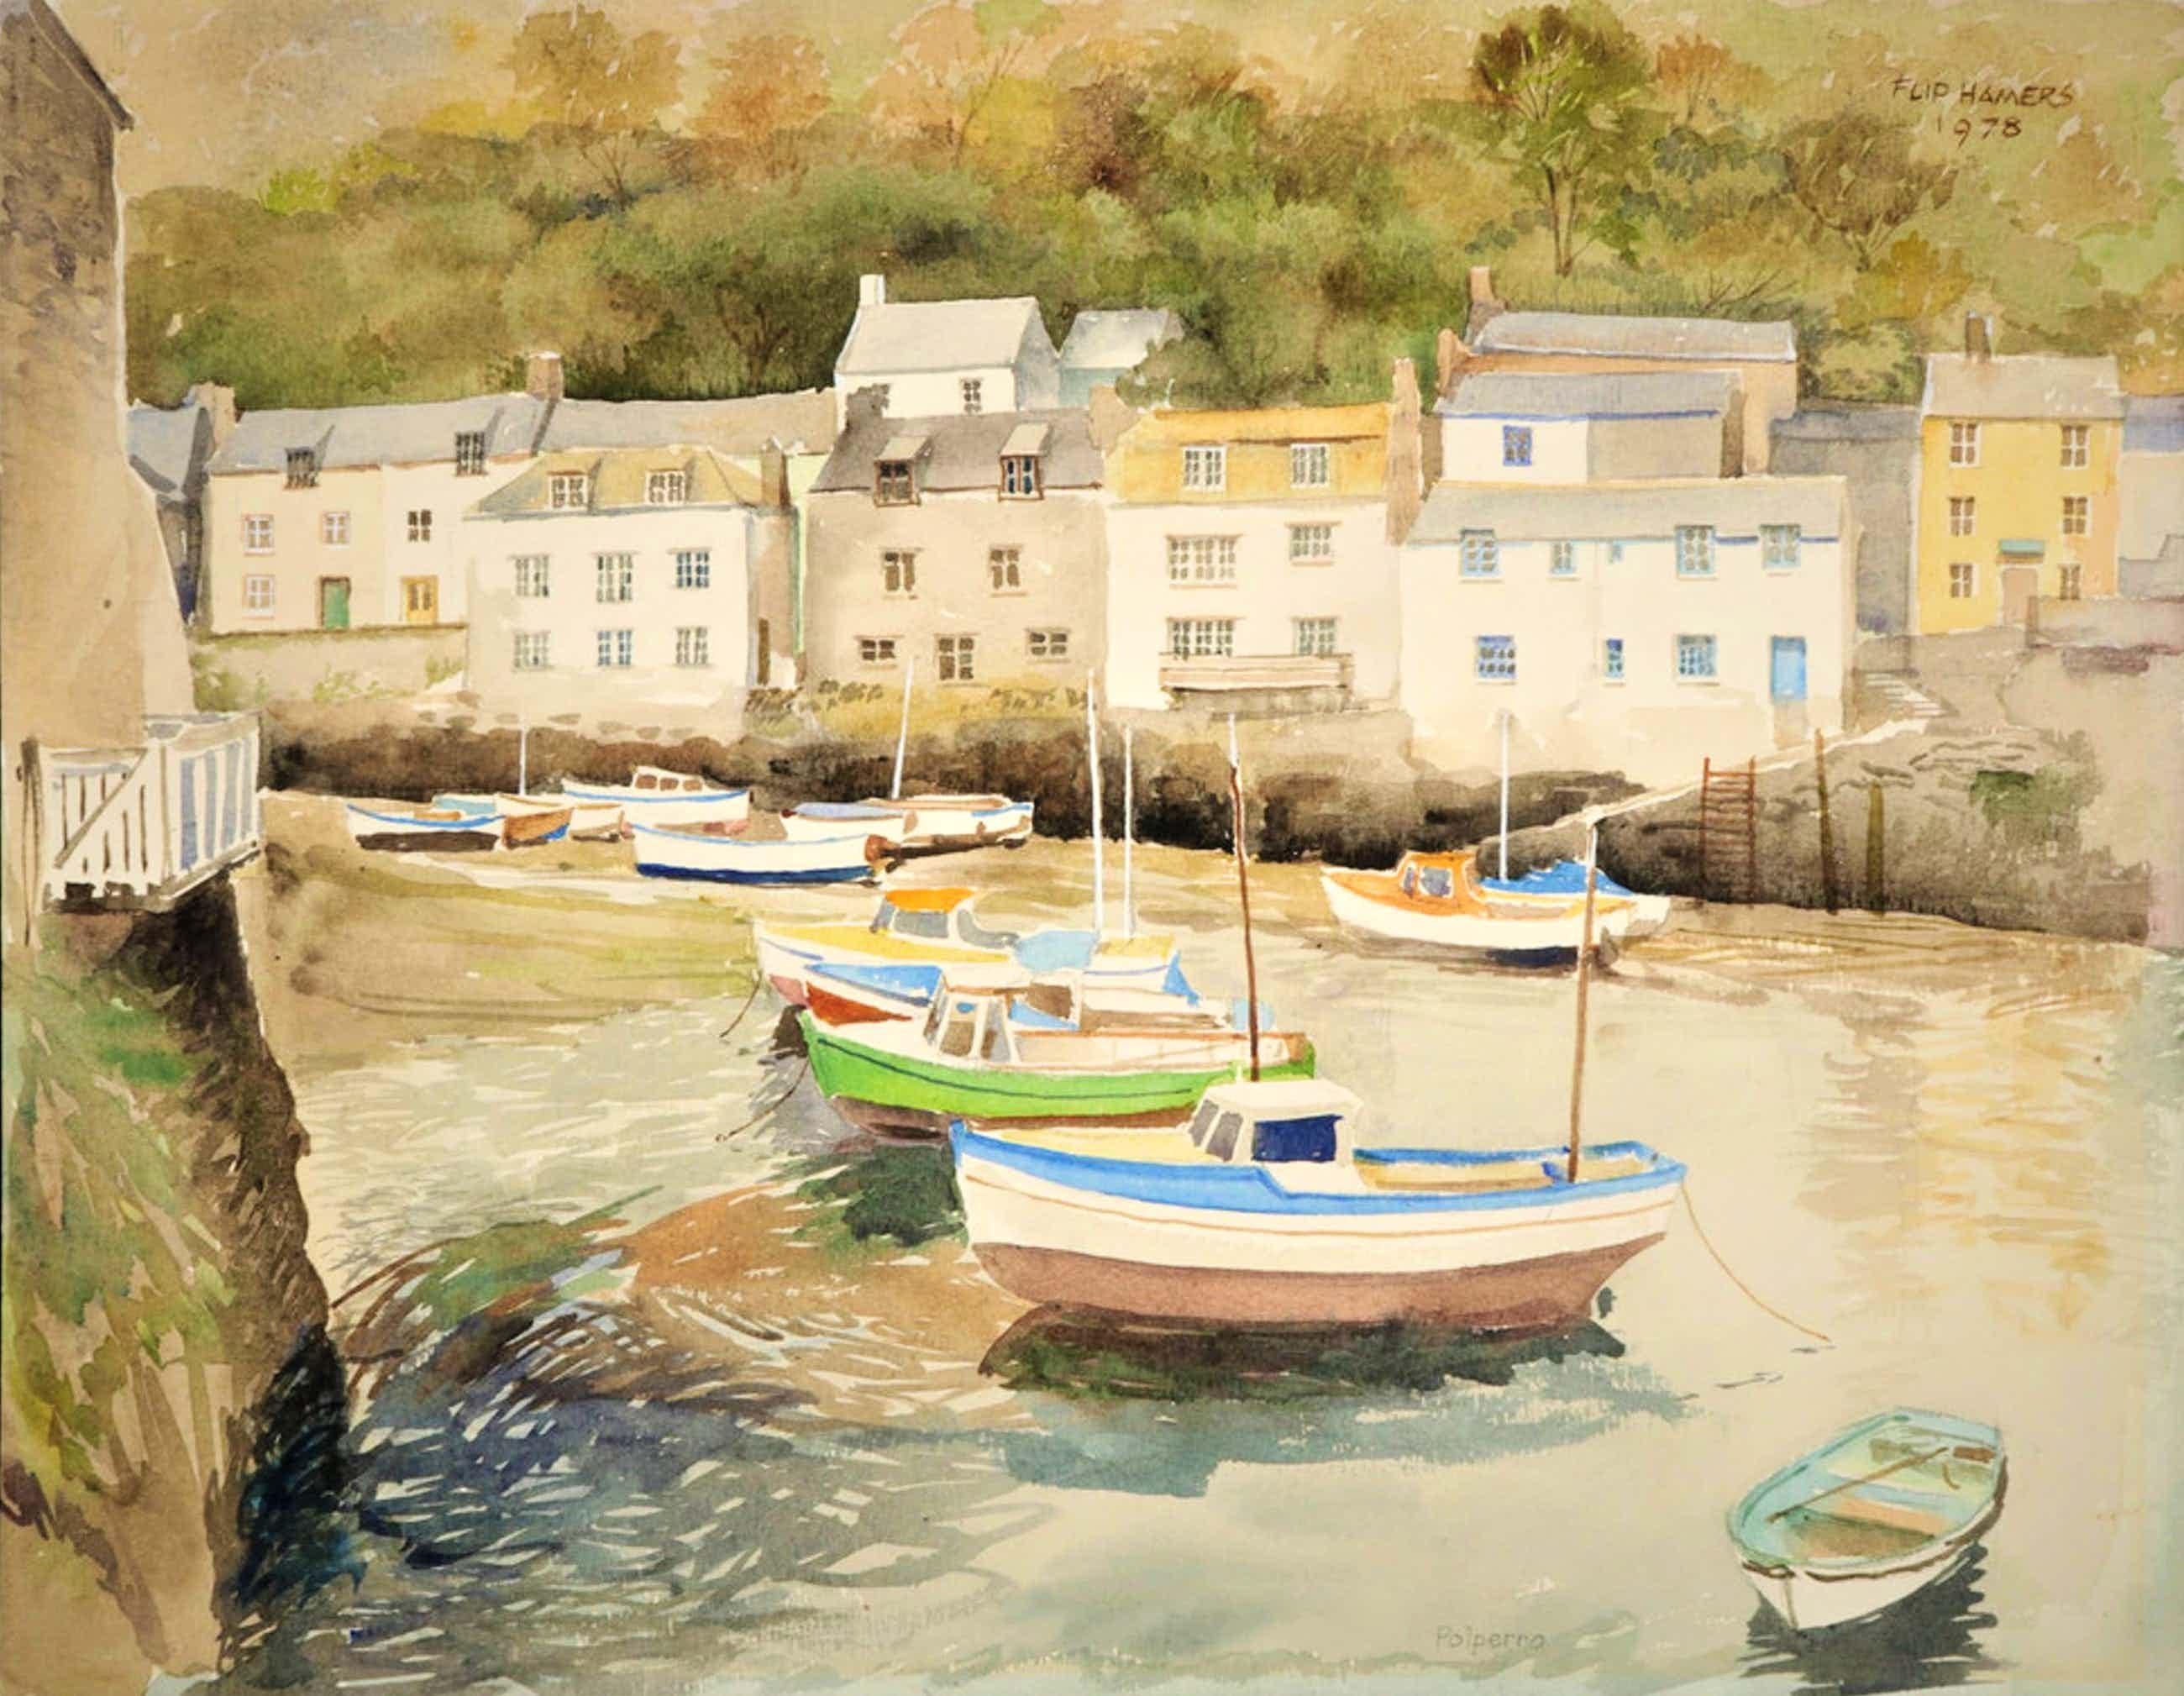 Flip Hamers - Polperro - Harbour Cornwall England kopen? Bied vanaf 70!